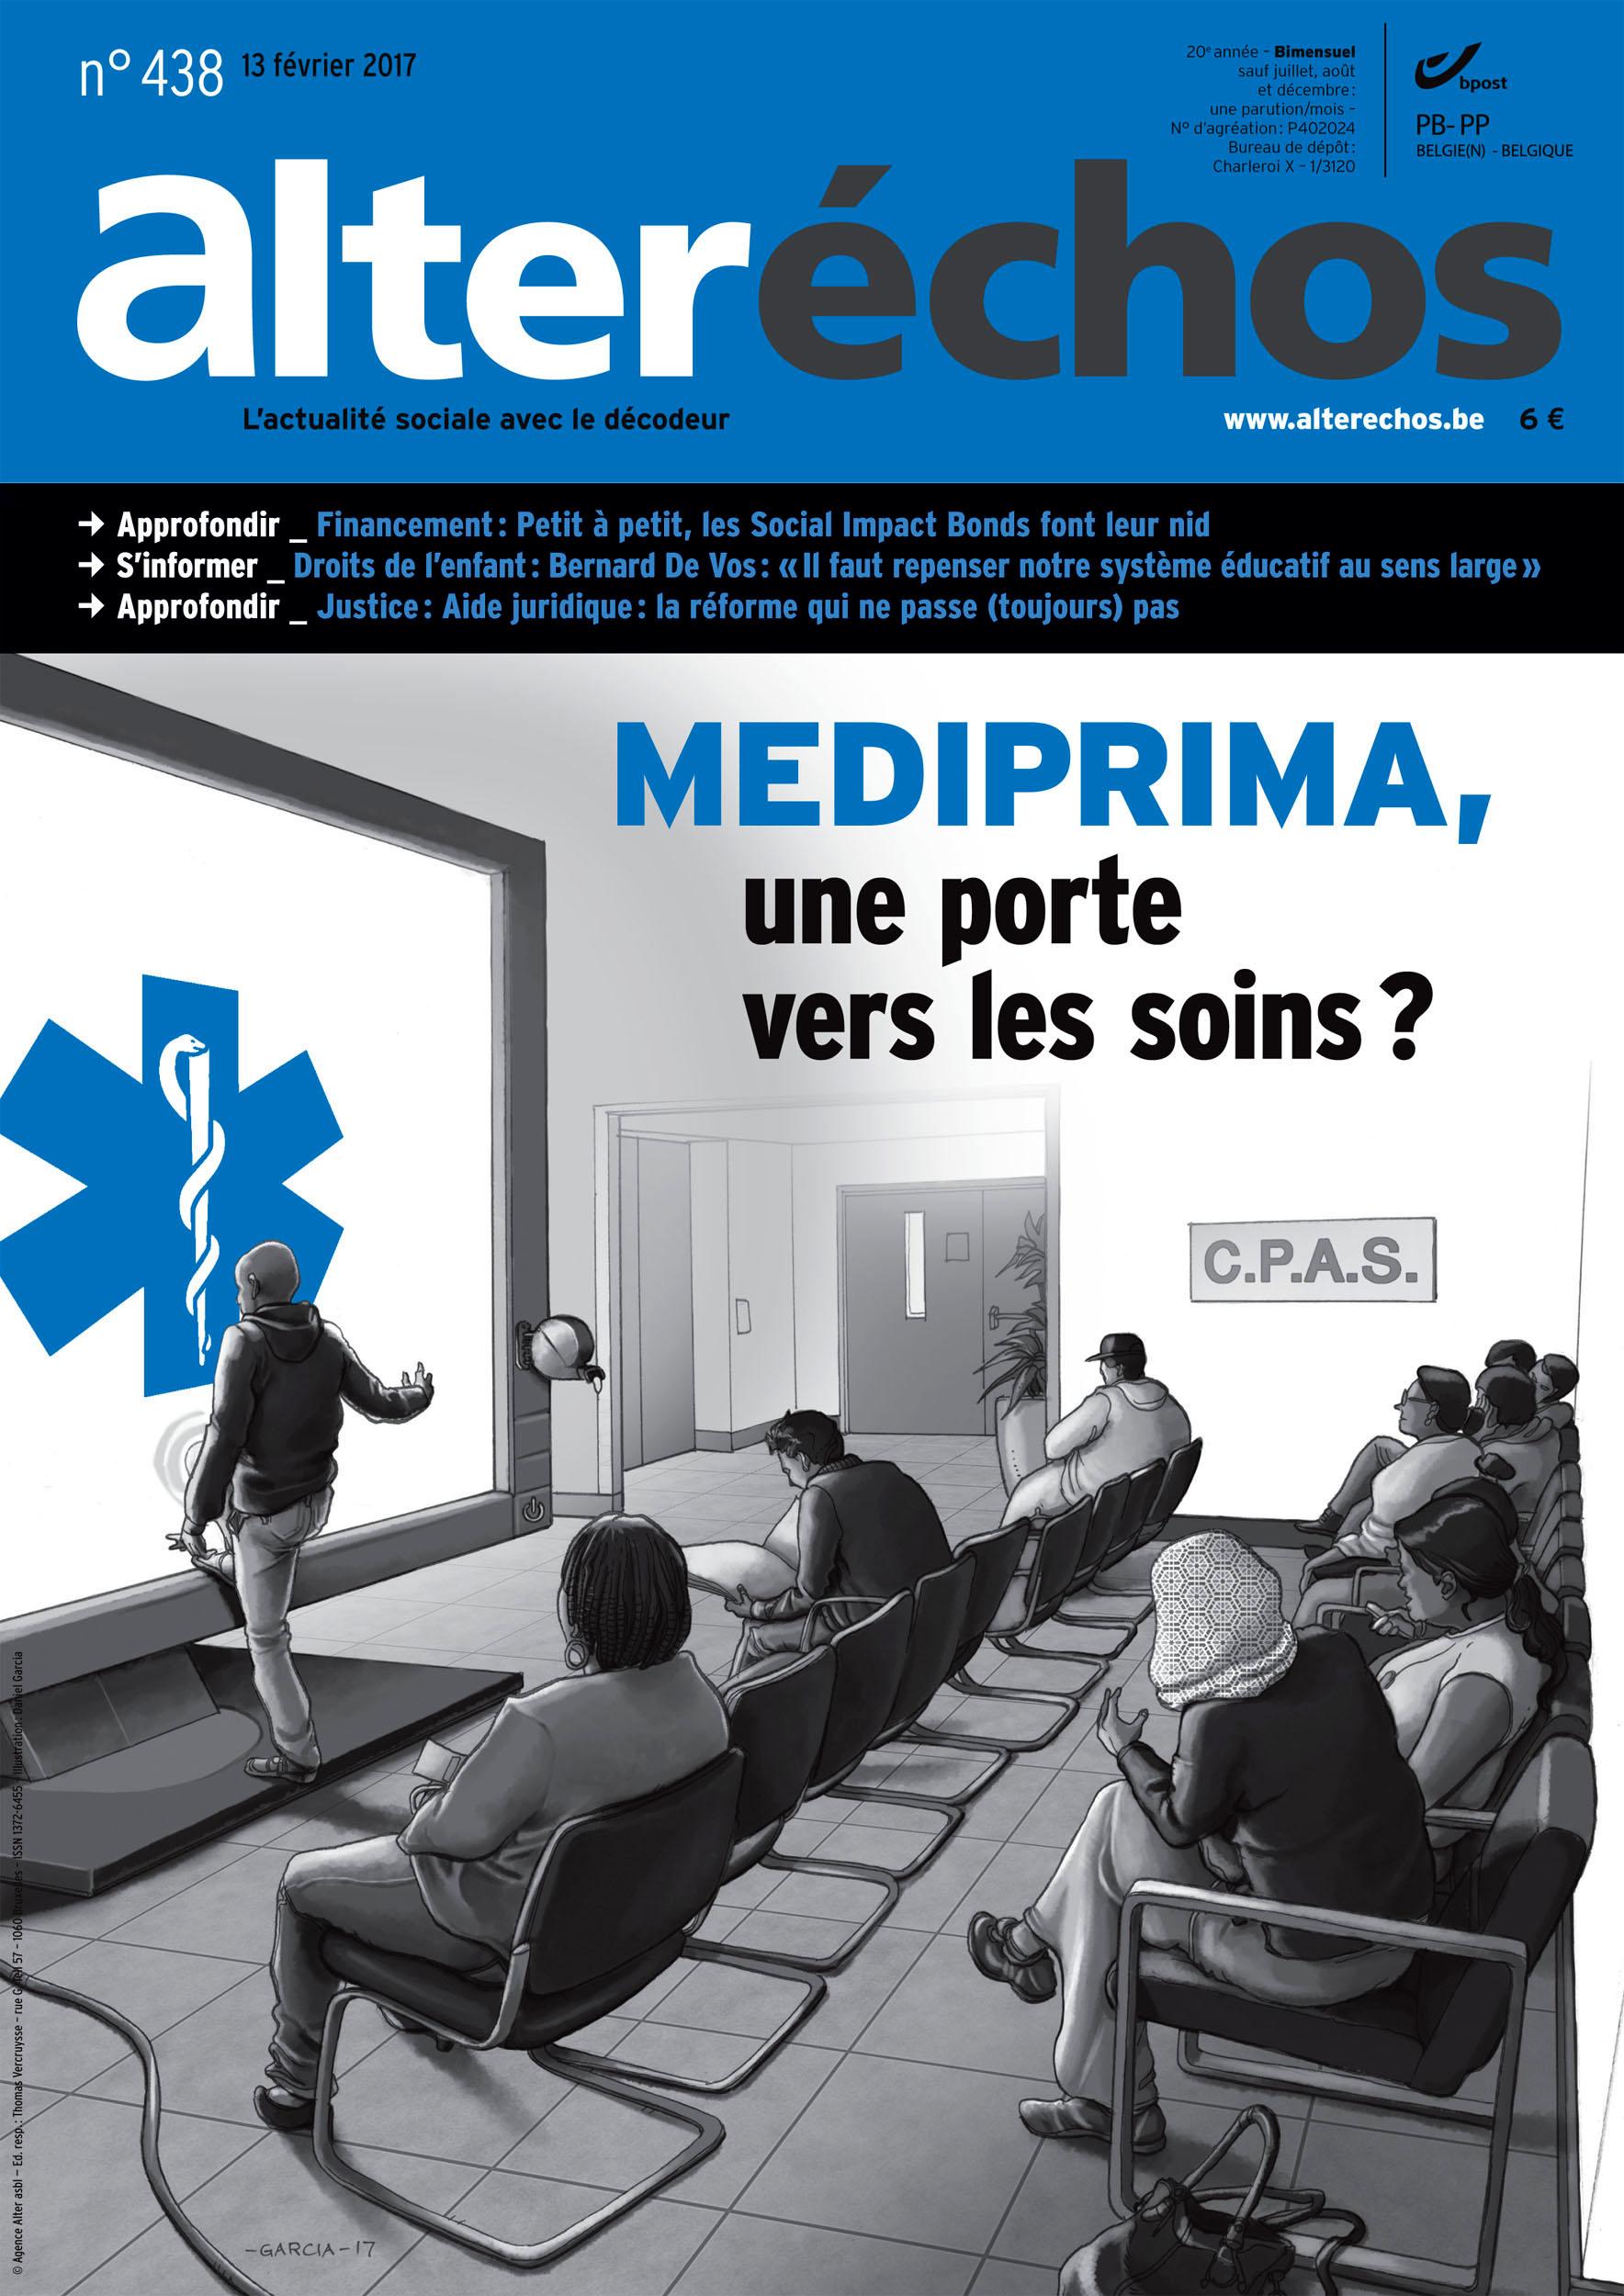 Daniel Garcia Alter Echos 438 Mediprima CPAS Social Belgium Belgique